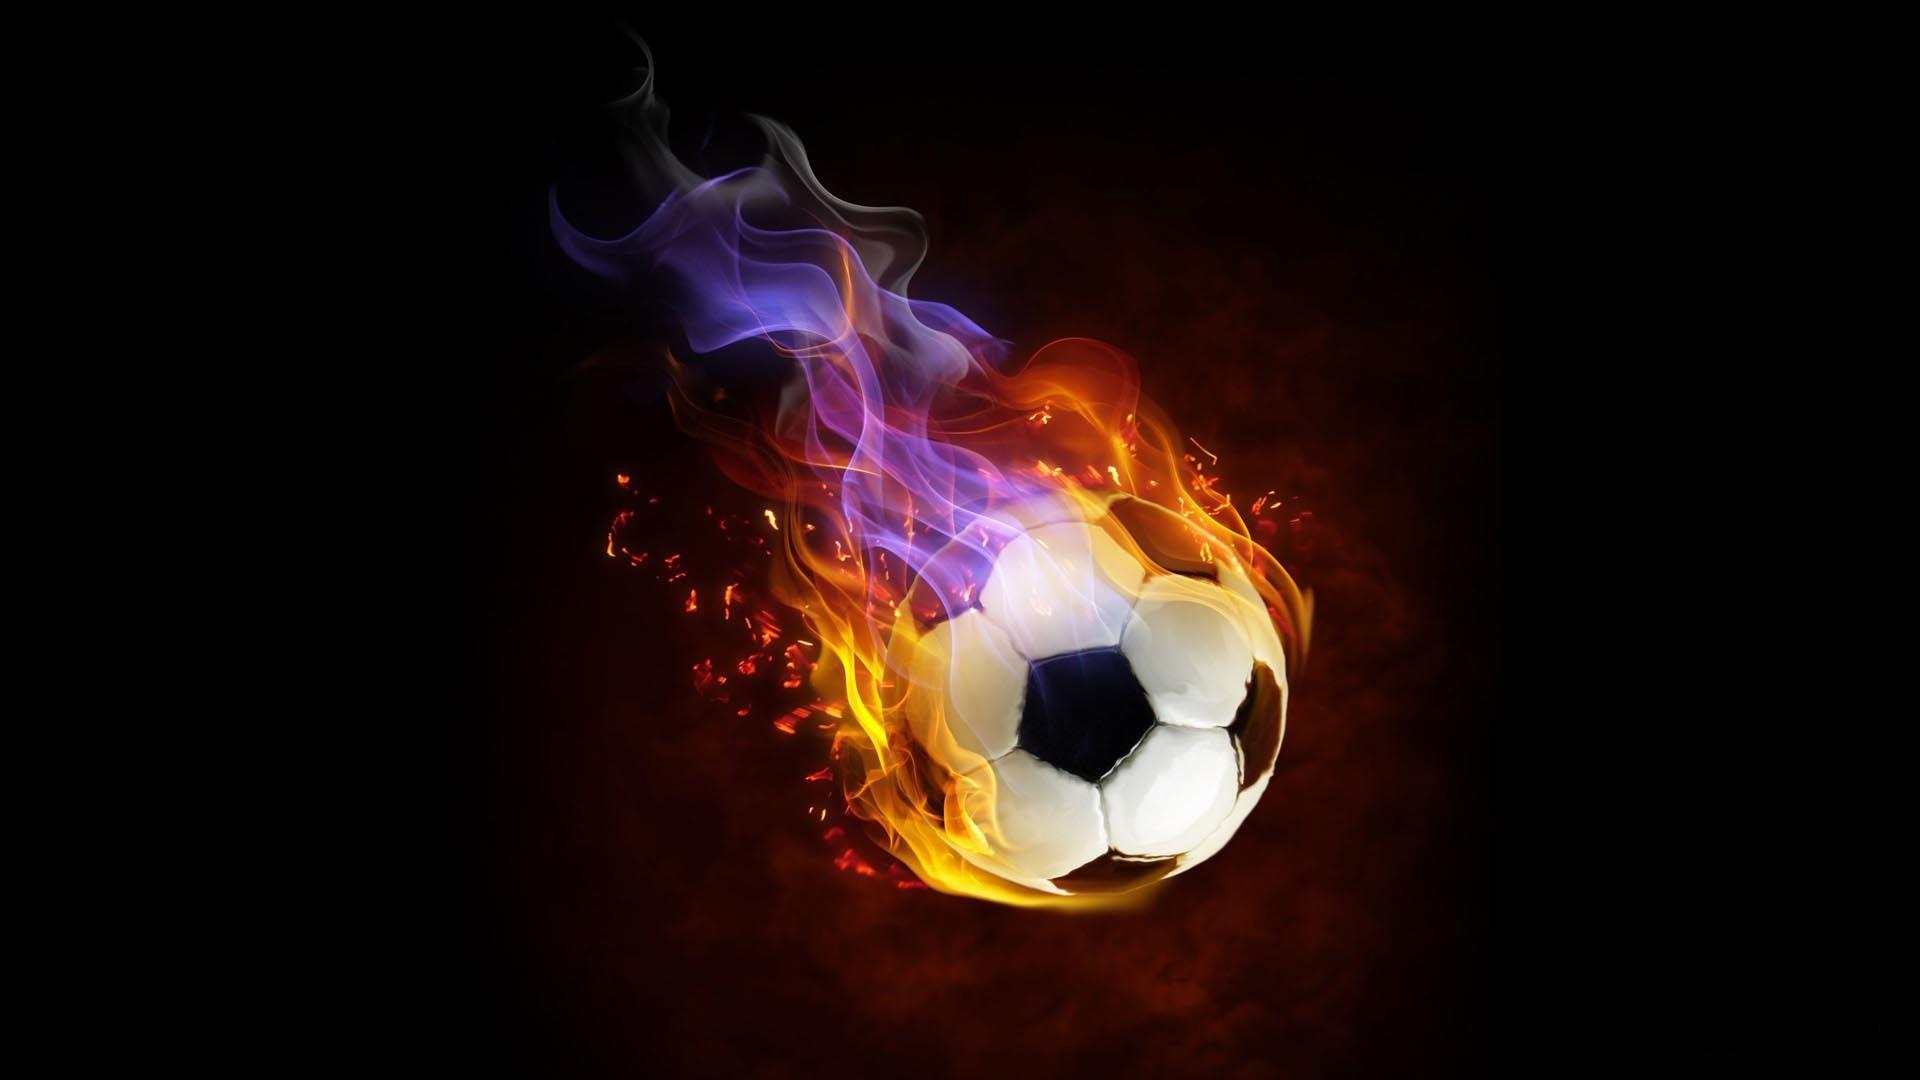 Cool soccer backgrounds 59 images 1920x1080 hd cool soccer wallpaper voltagebd Images